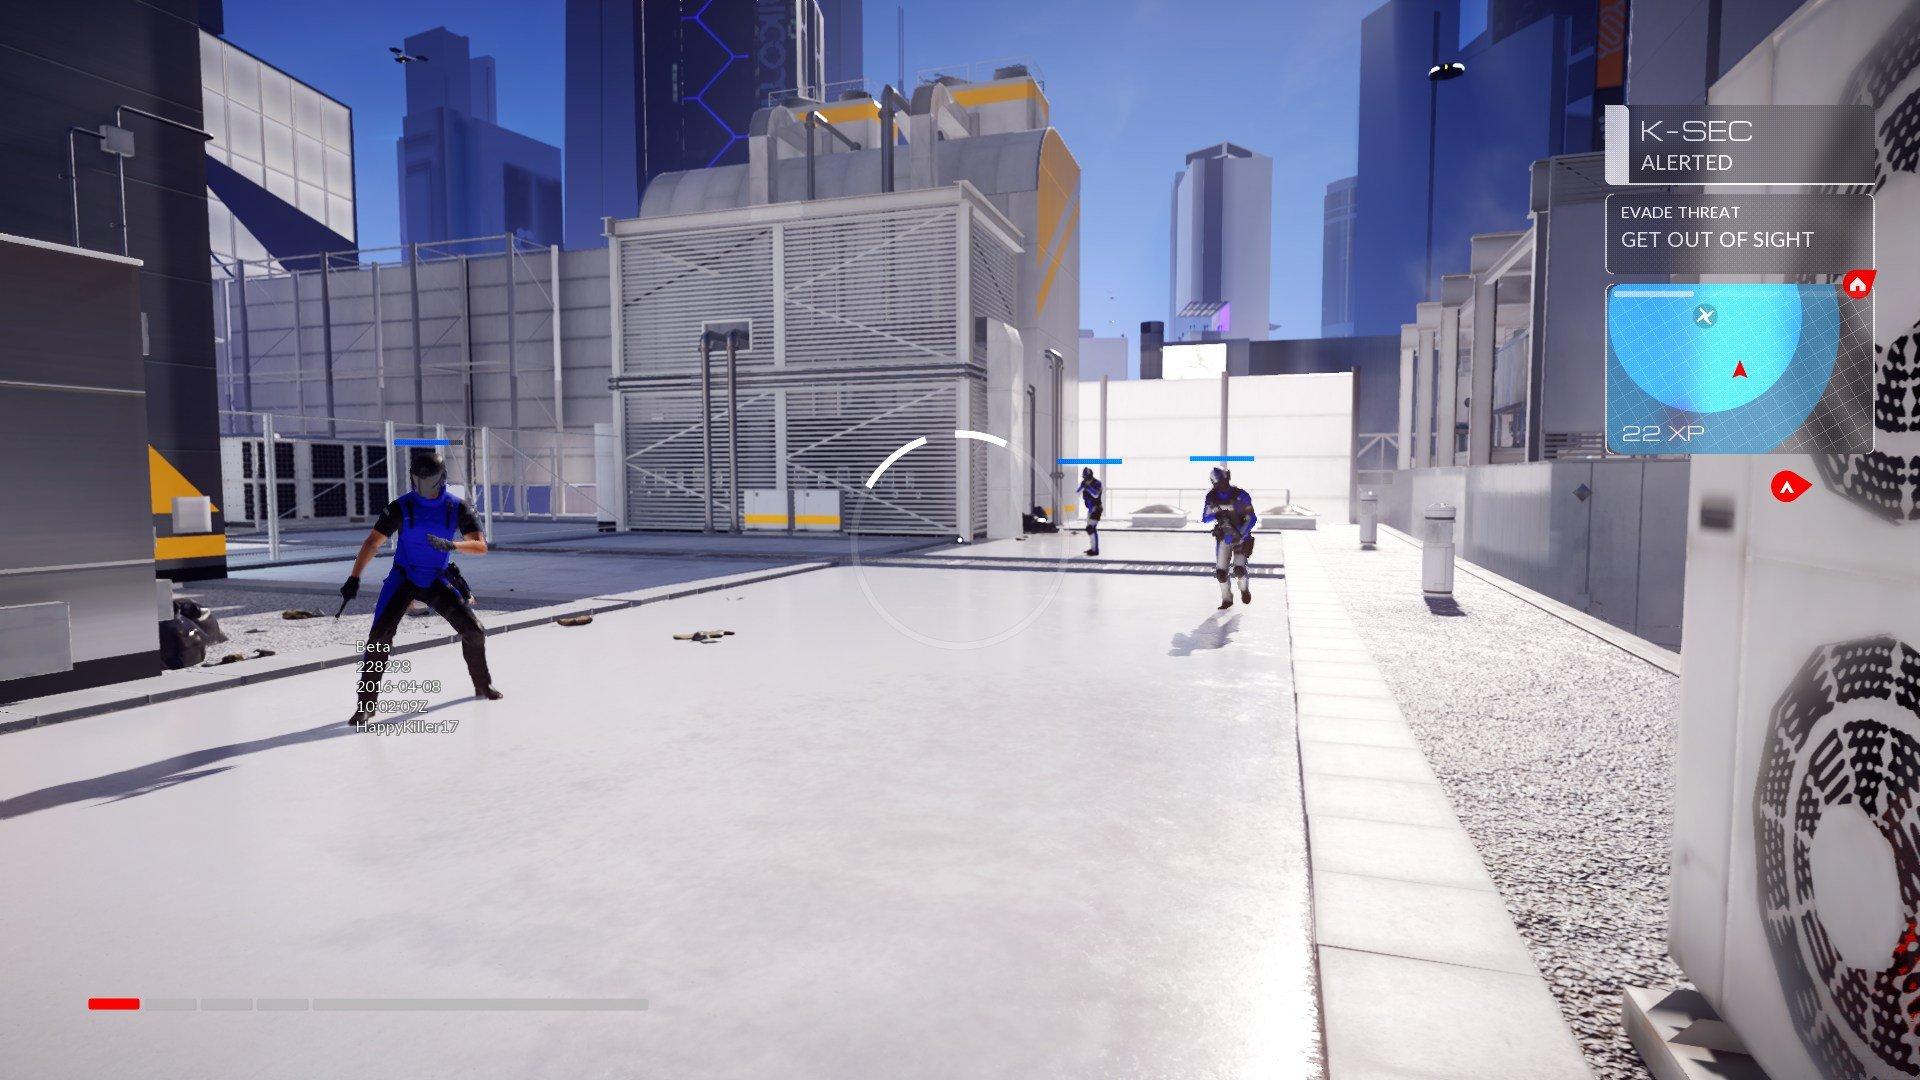 Впечатления от Mirrors Edge Catalyst Closed Beta. - Изображение 6